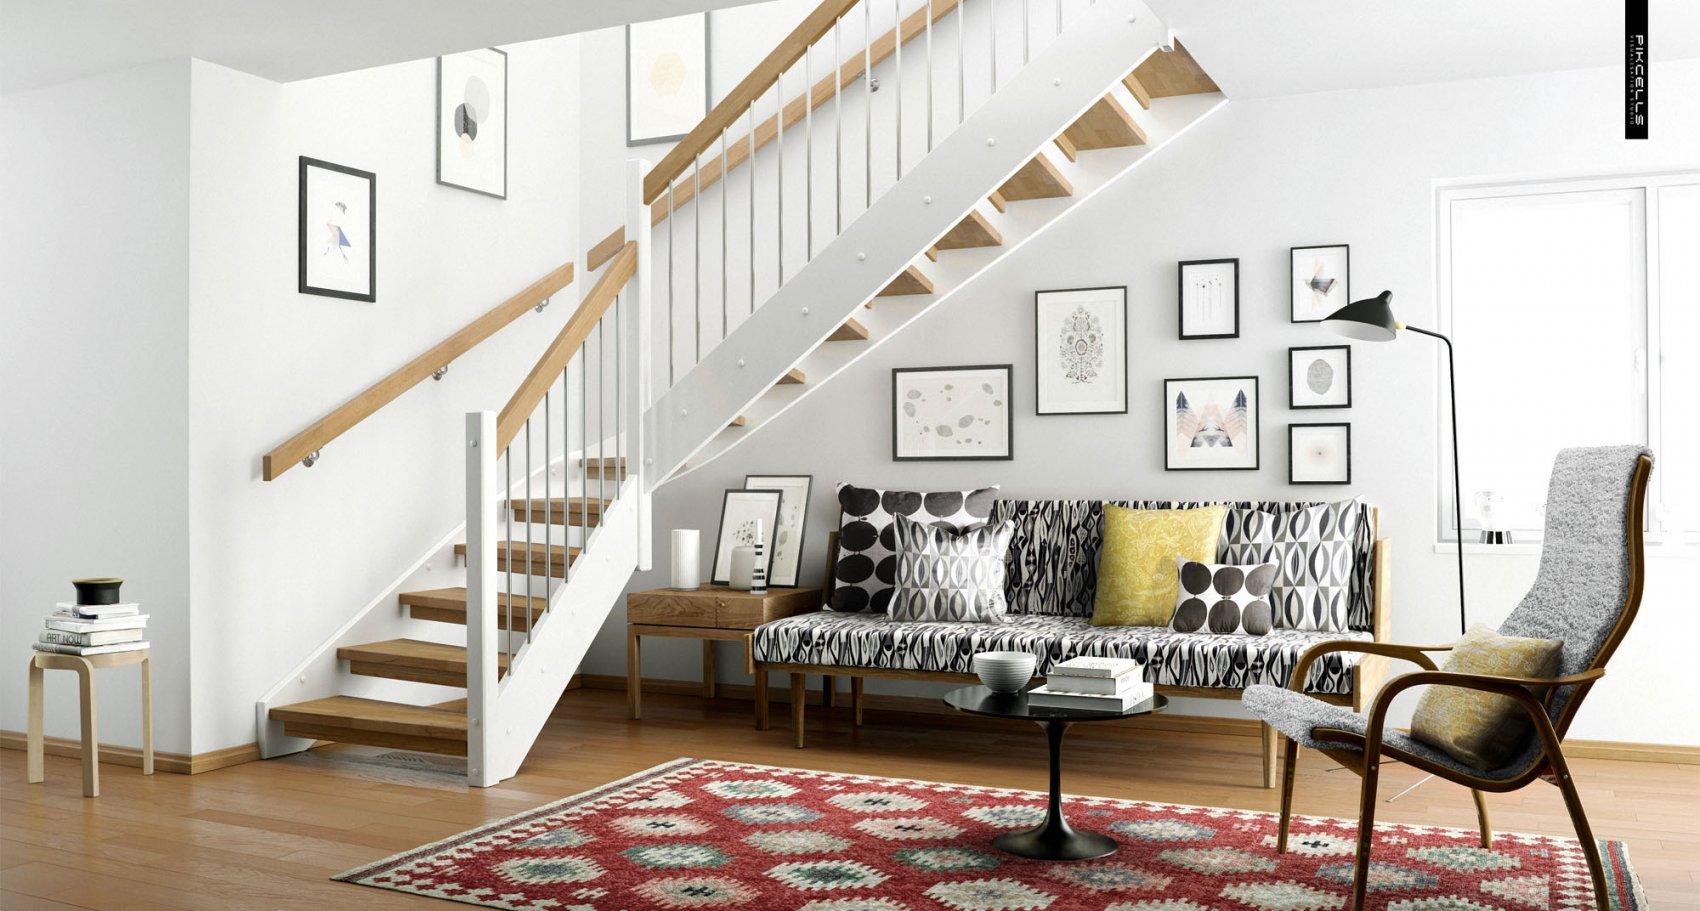 Fullsize Of Traditional Living Room Interior Design